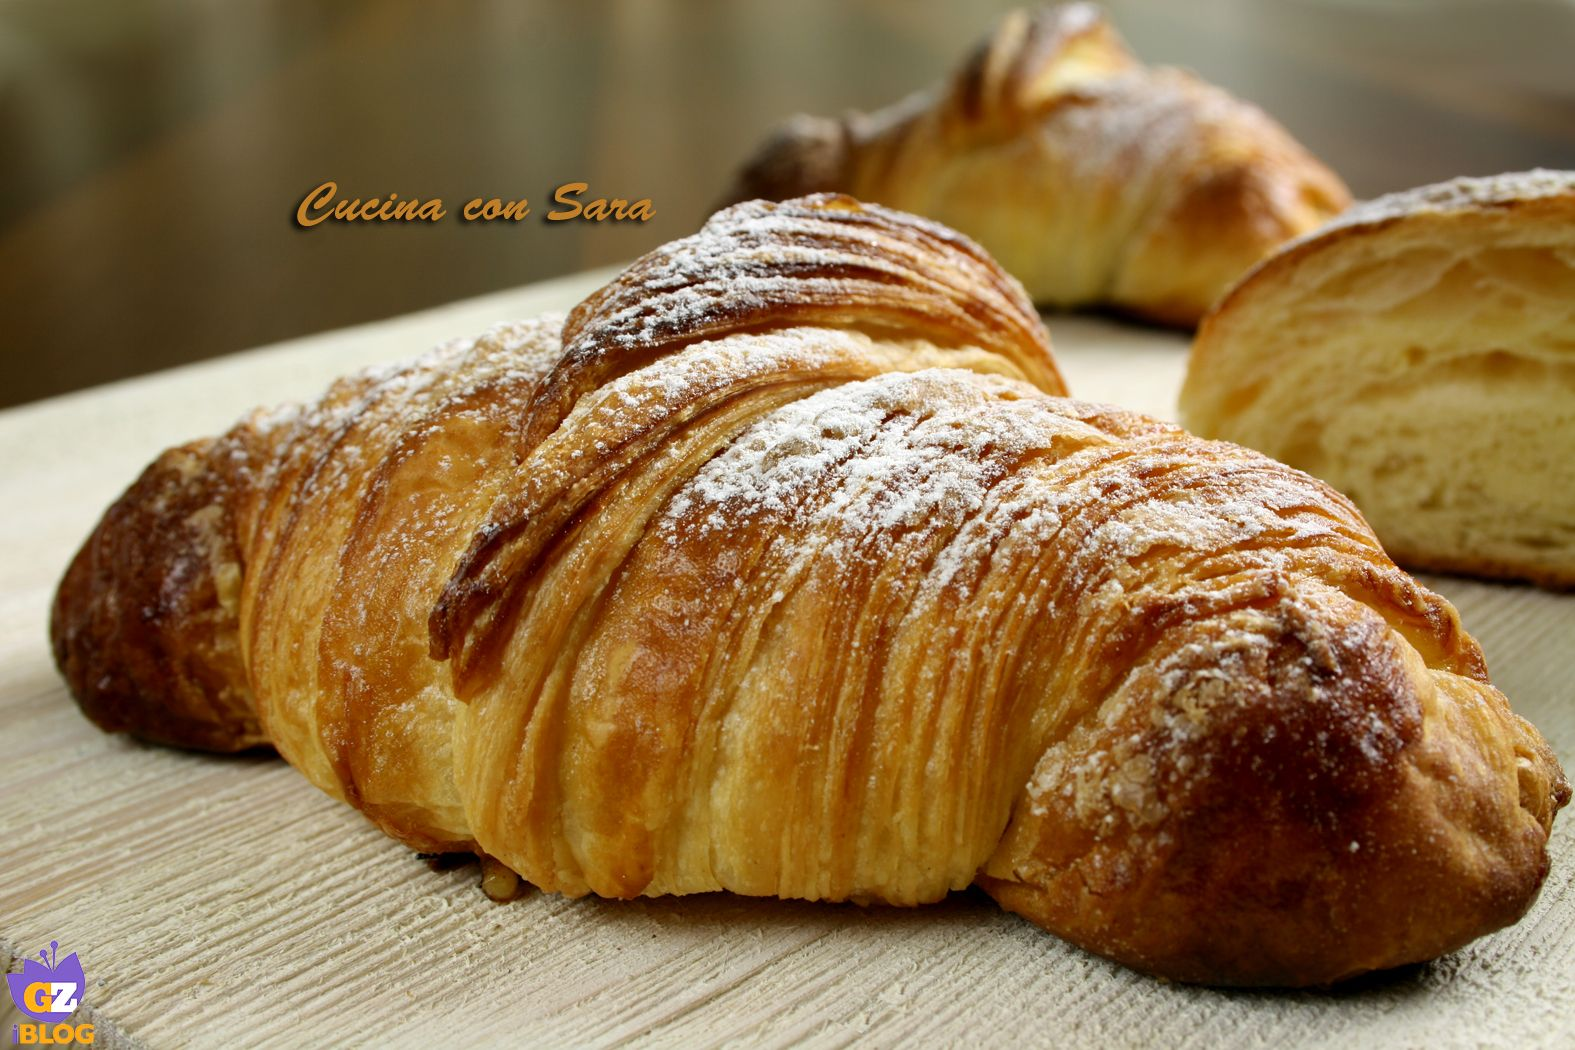 9cd1b1a0ef4db7caadd010e7e612256f - Croissant Ricette